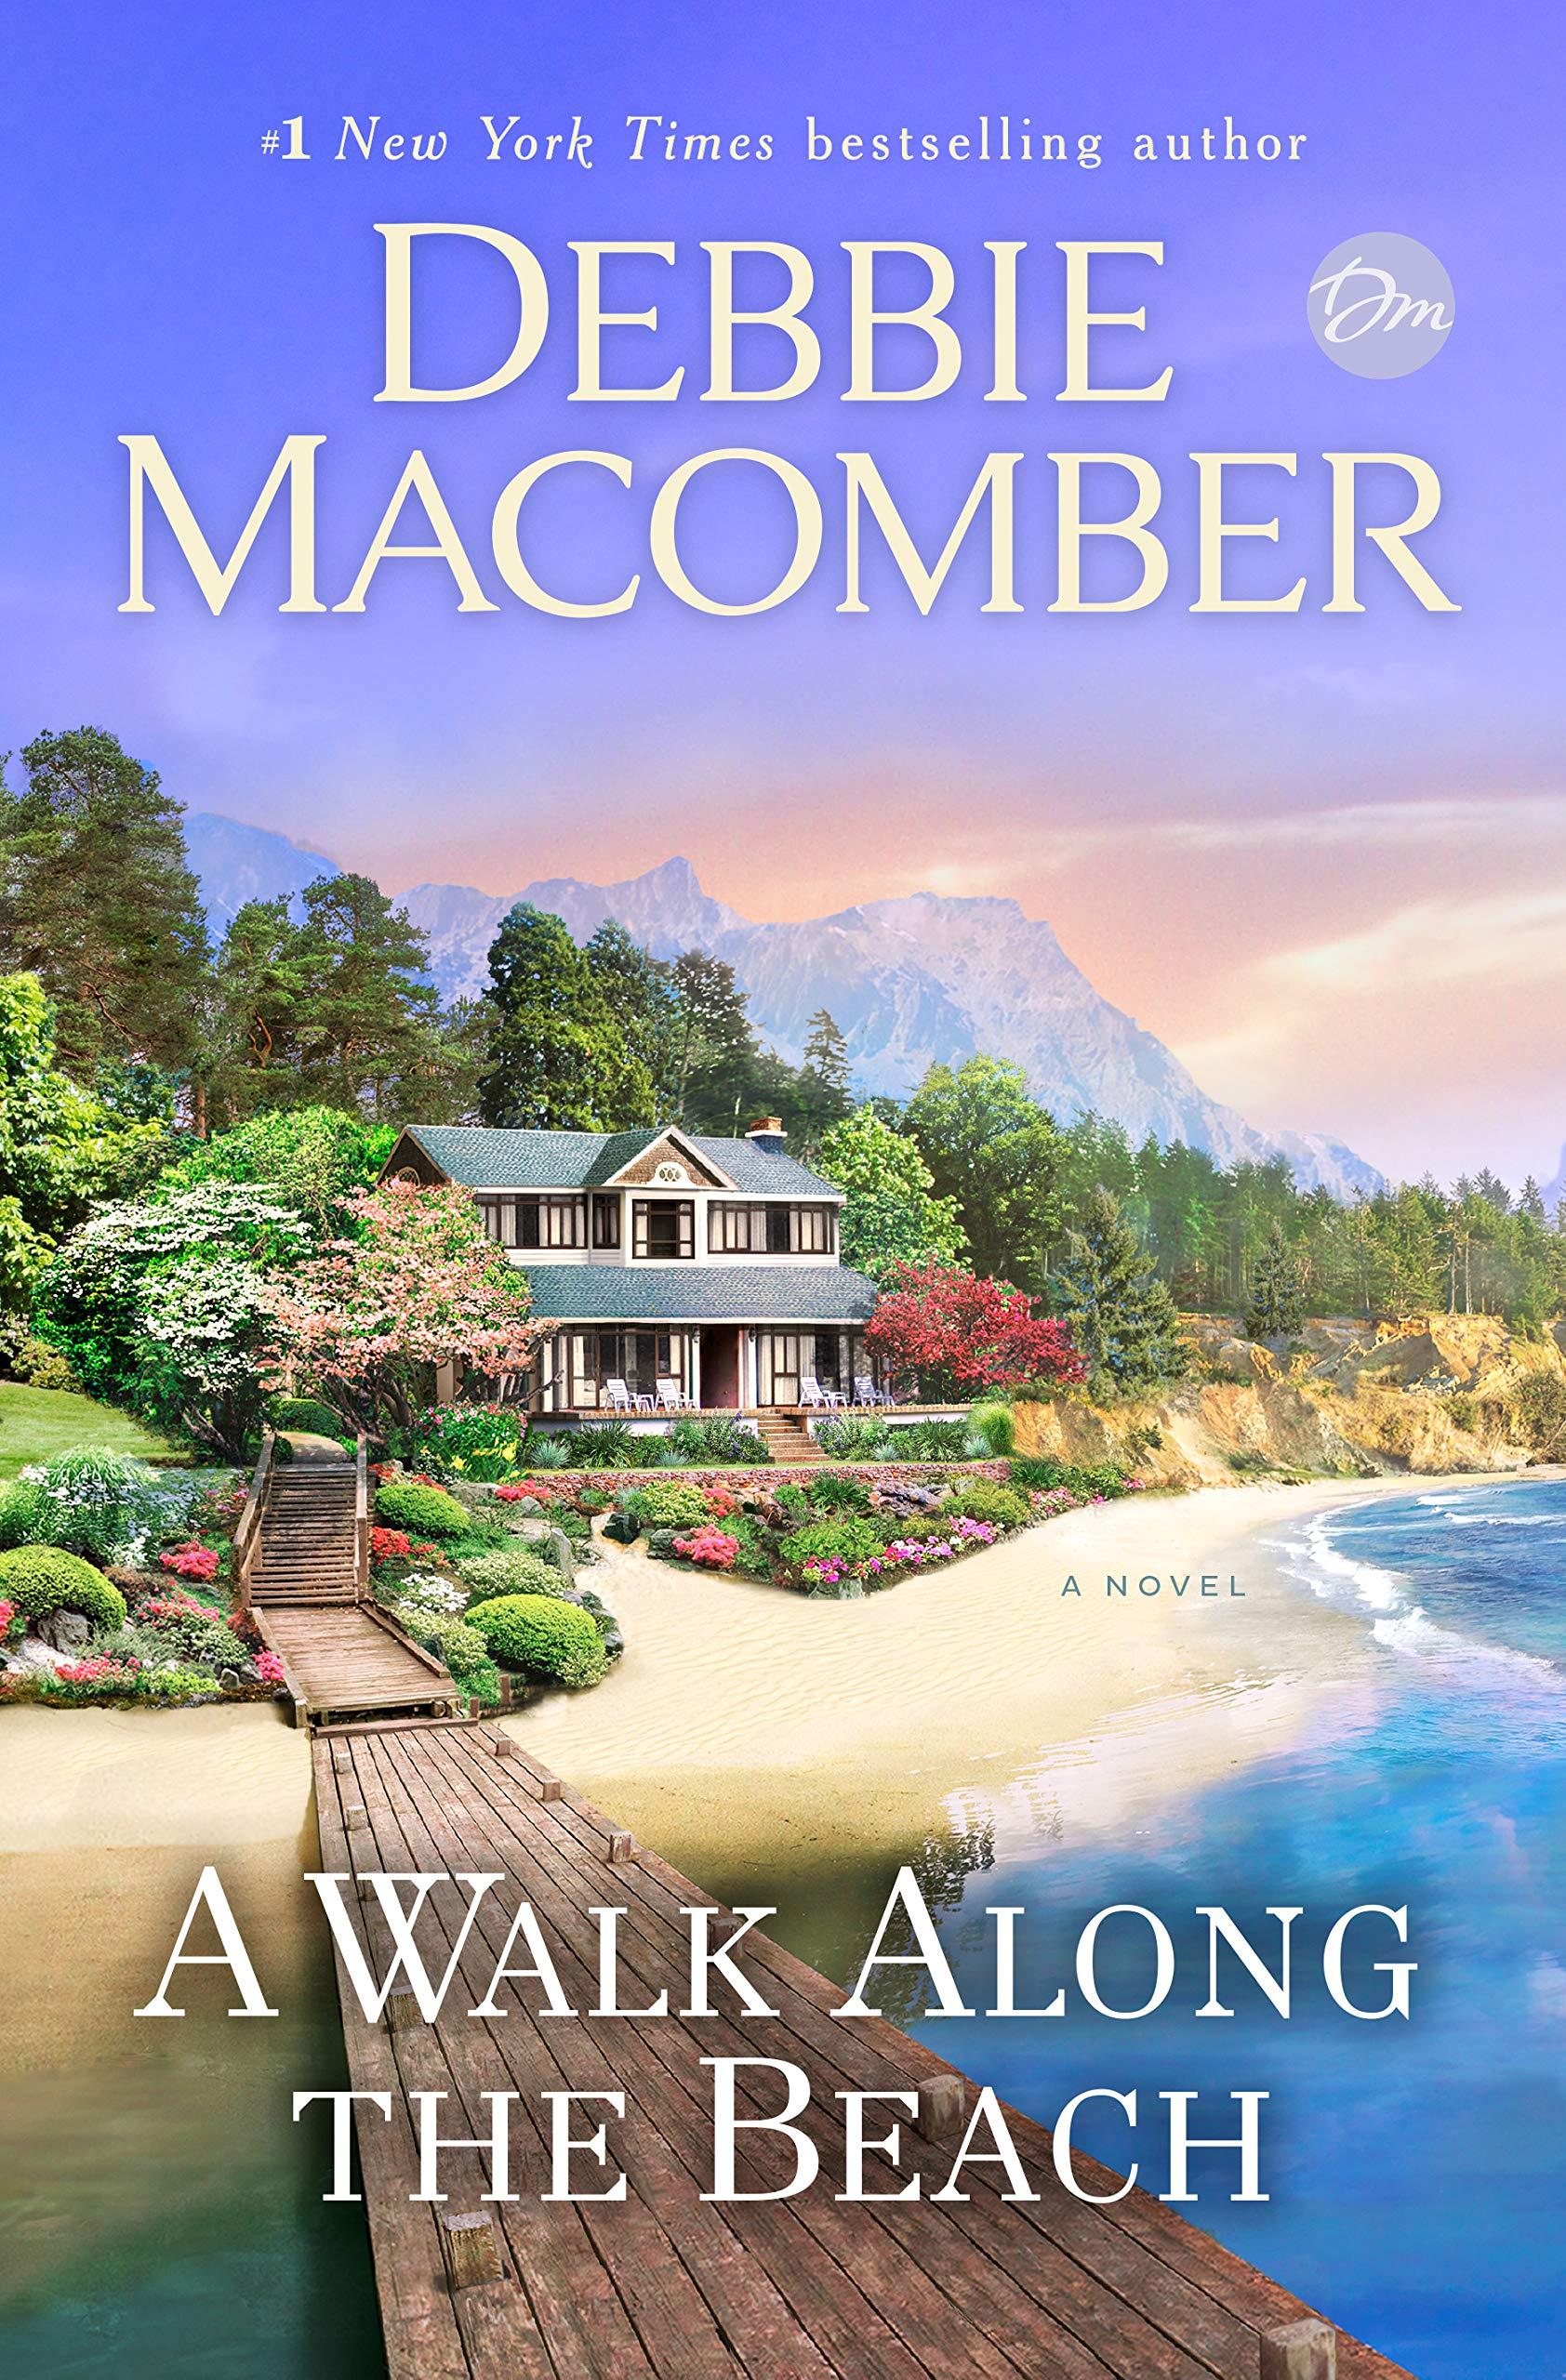 New Christmas Book For 2020 By Debbie Macomber A Walk Along the Beach: A Novel: Macomber, Debbie: 9780399181368